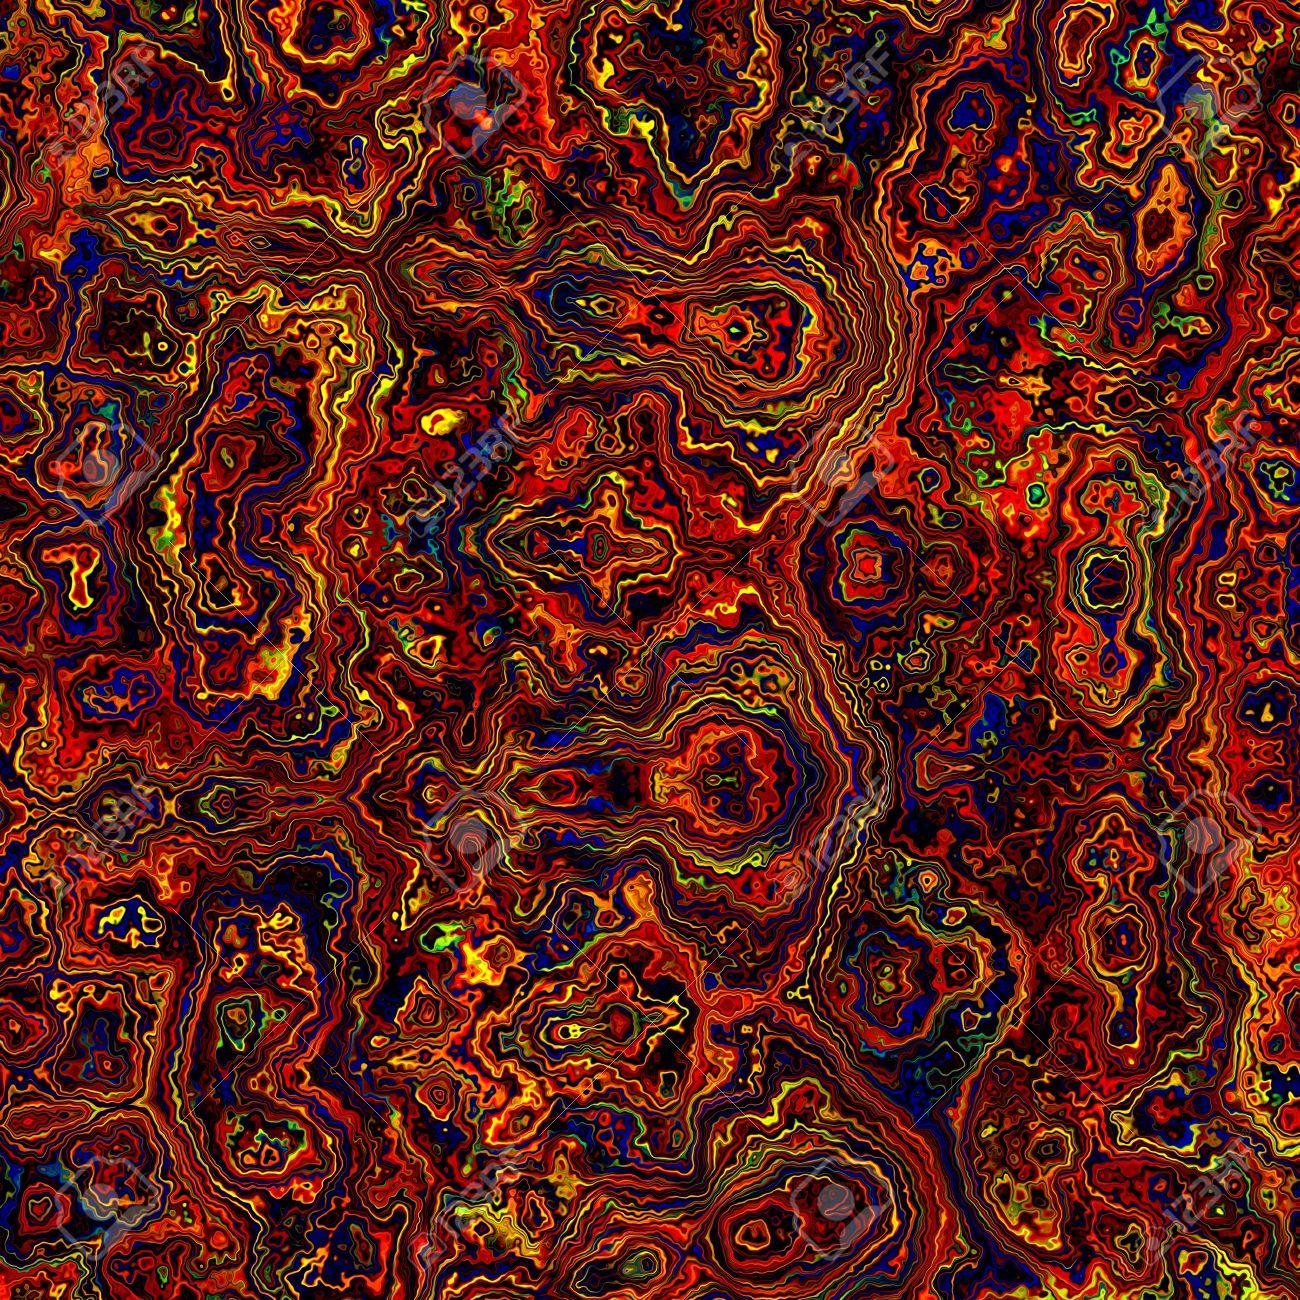 I love weird colorful art - image #2729603 by KSENIA_L on Favim.com